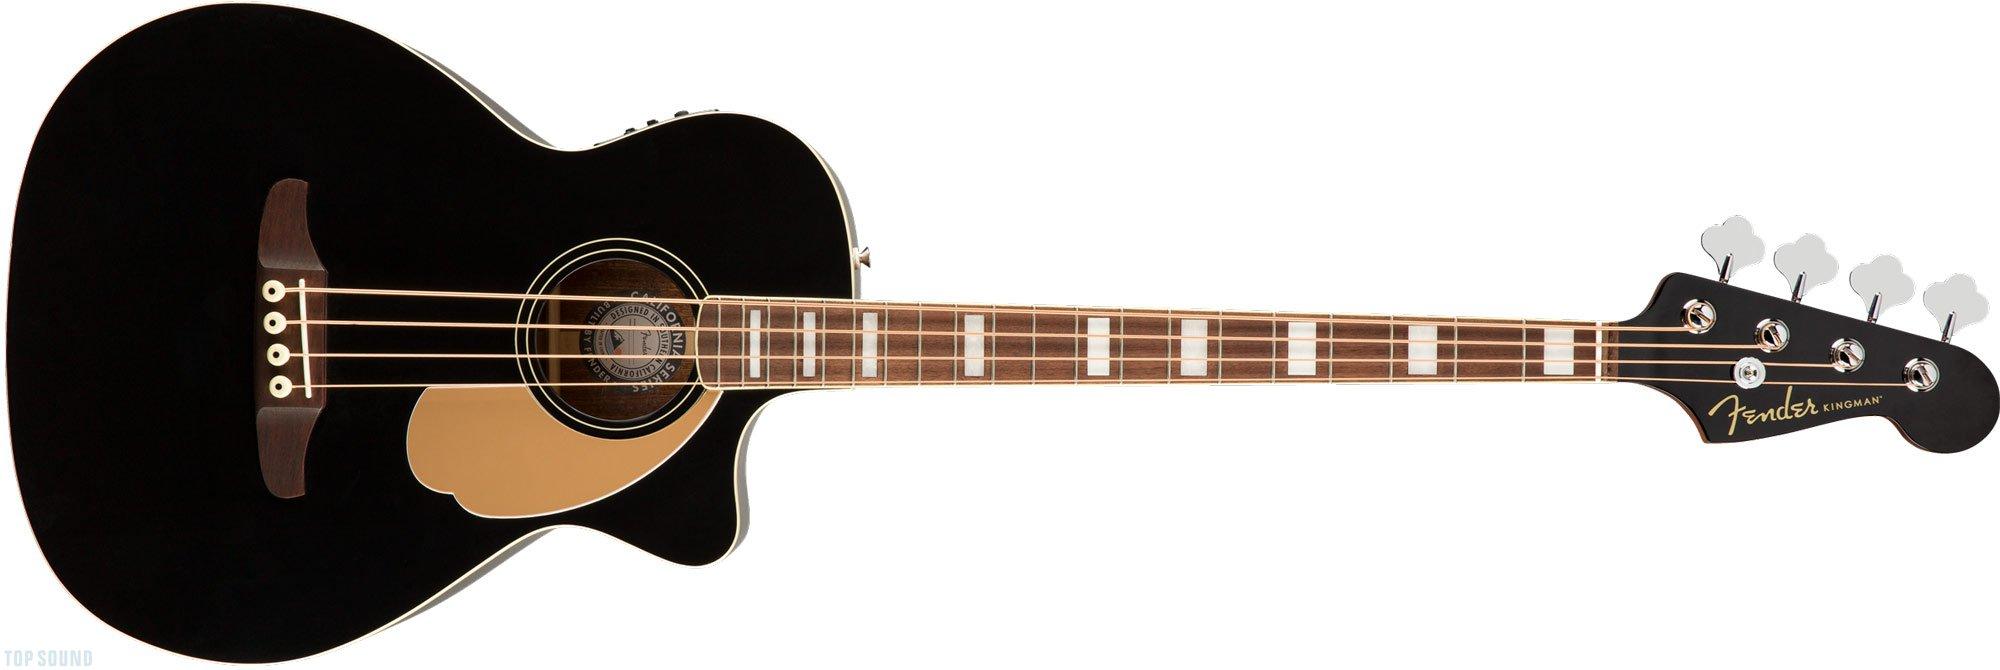 FENDER Kingman Bass Black WF 0970743106